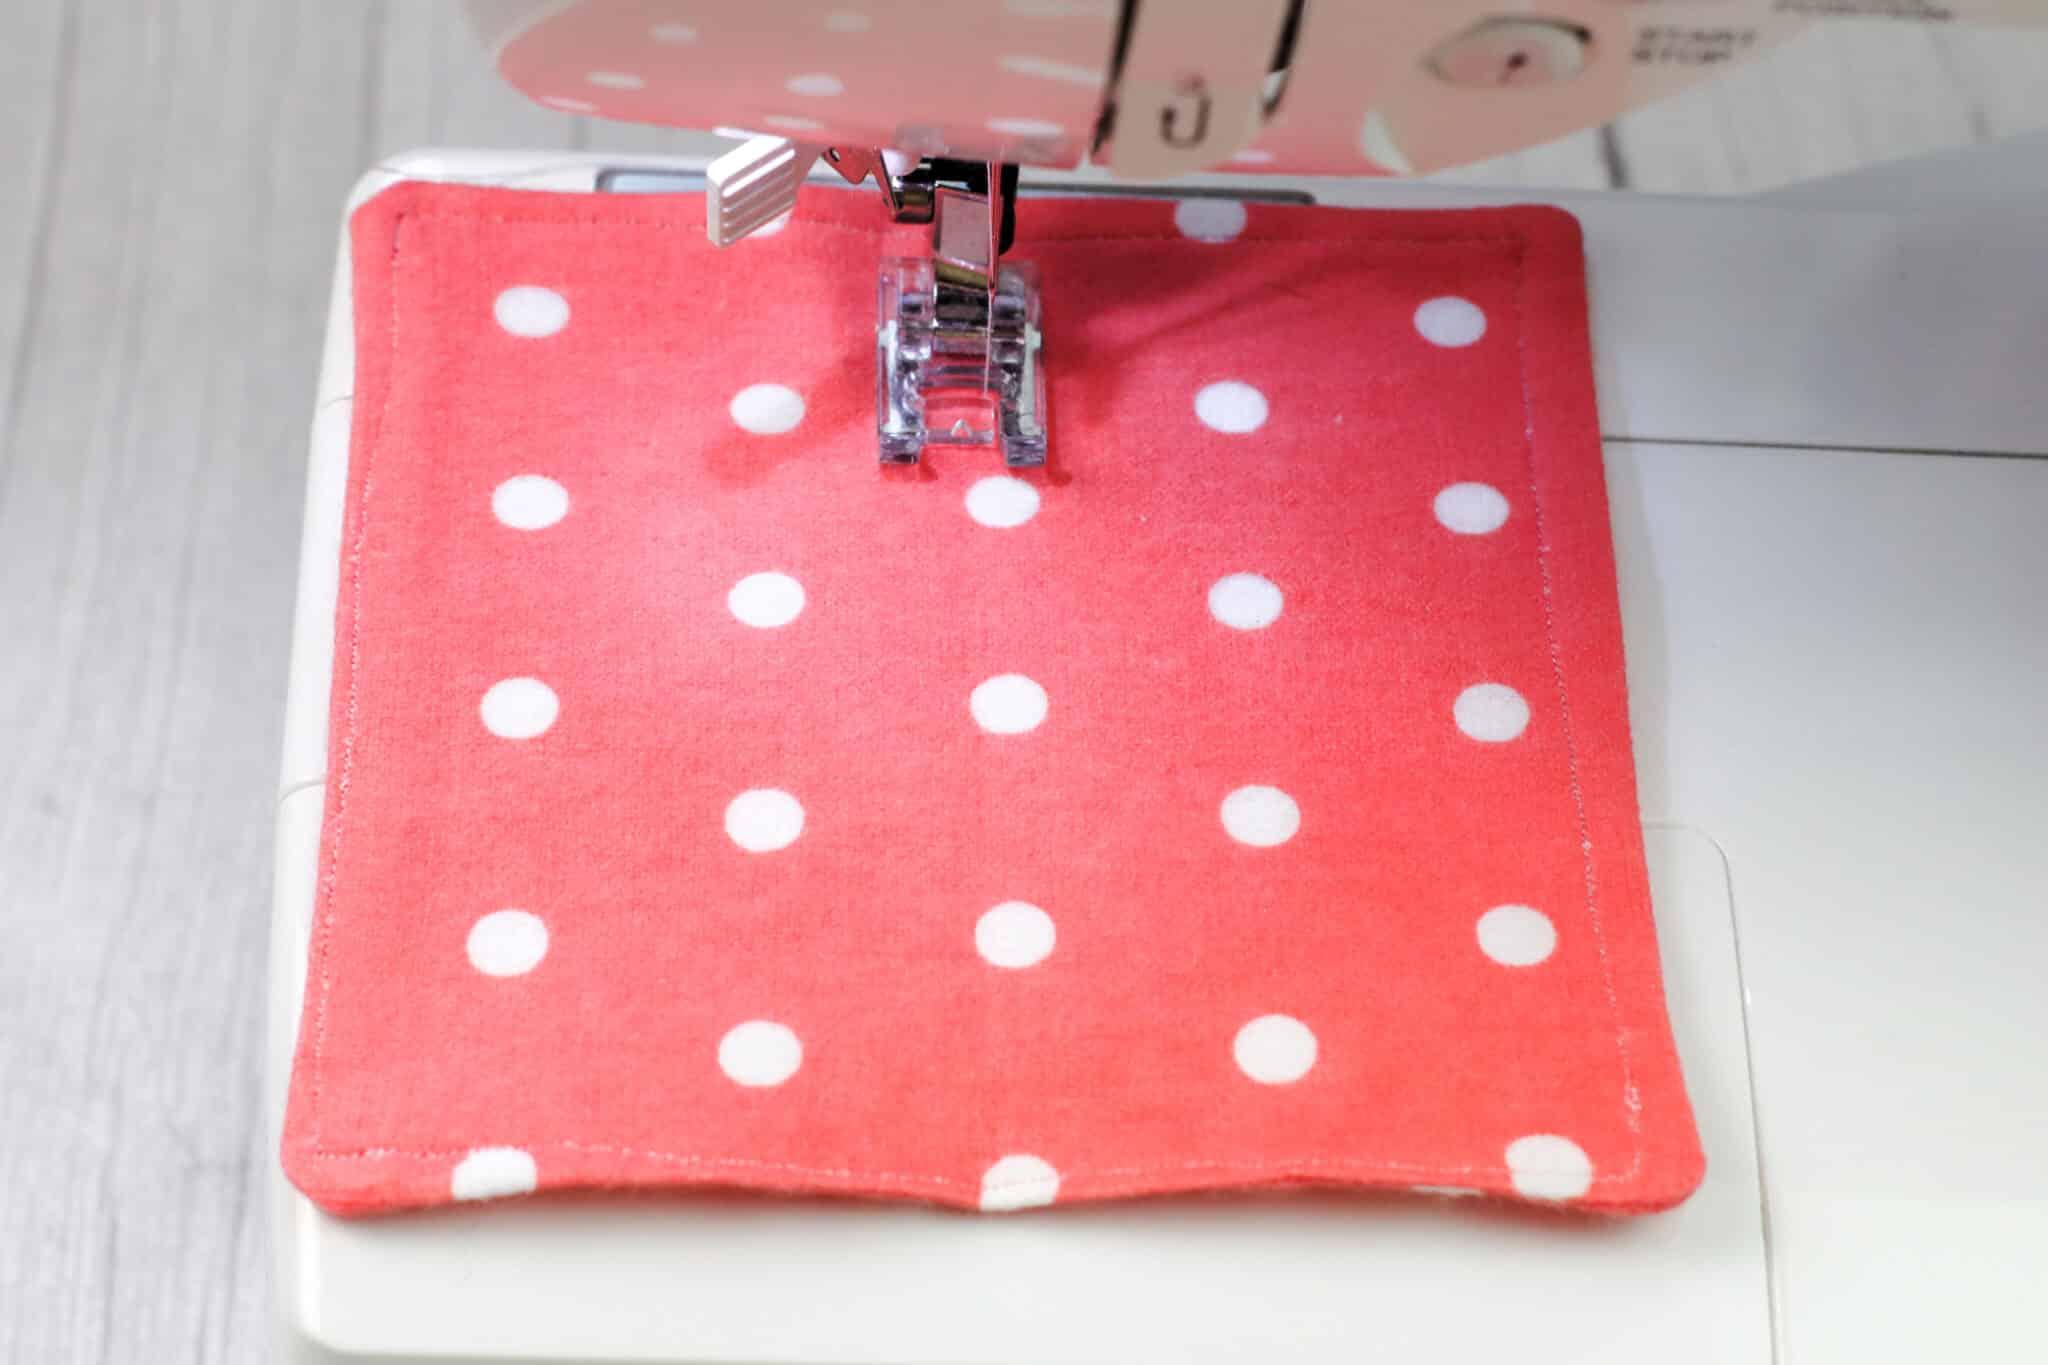 machine sewing seam through dryer sheet